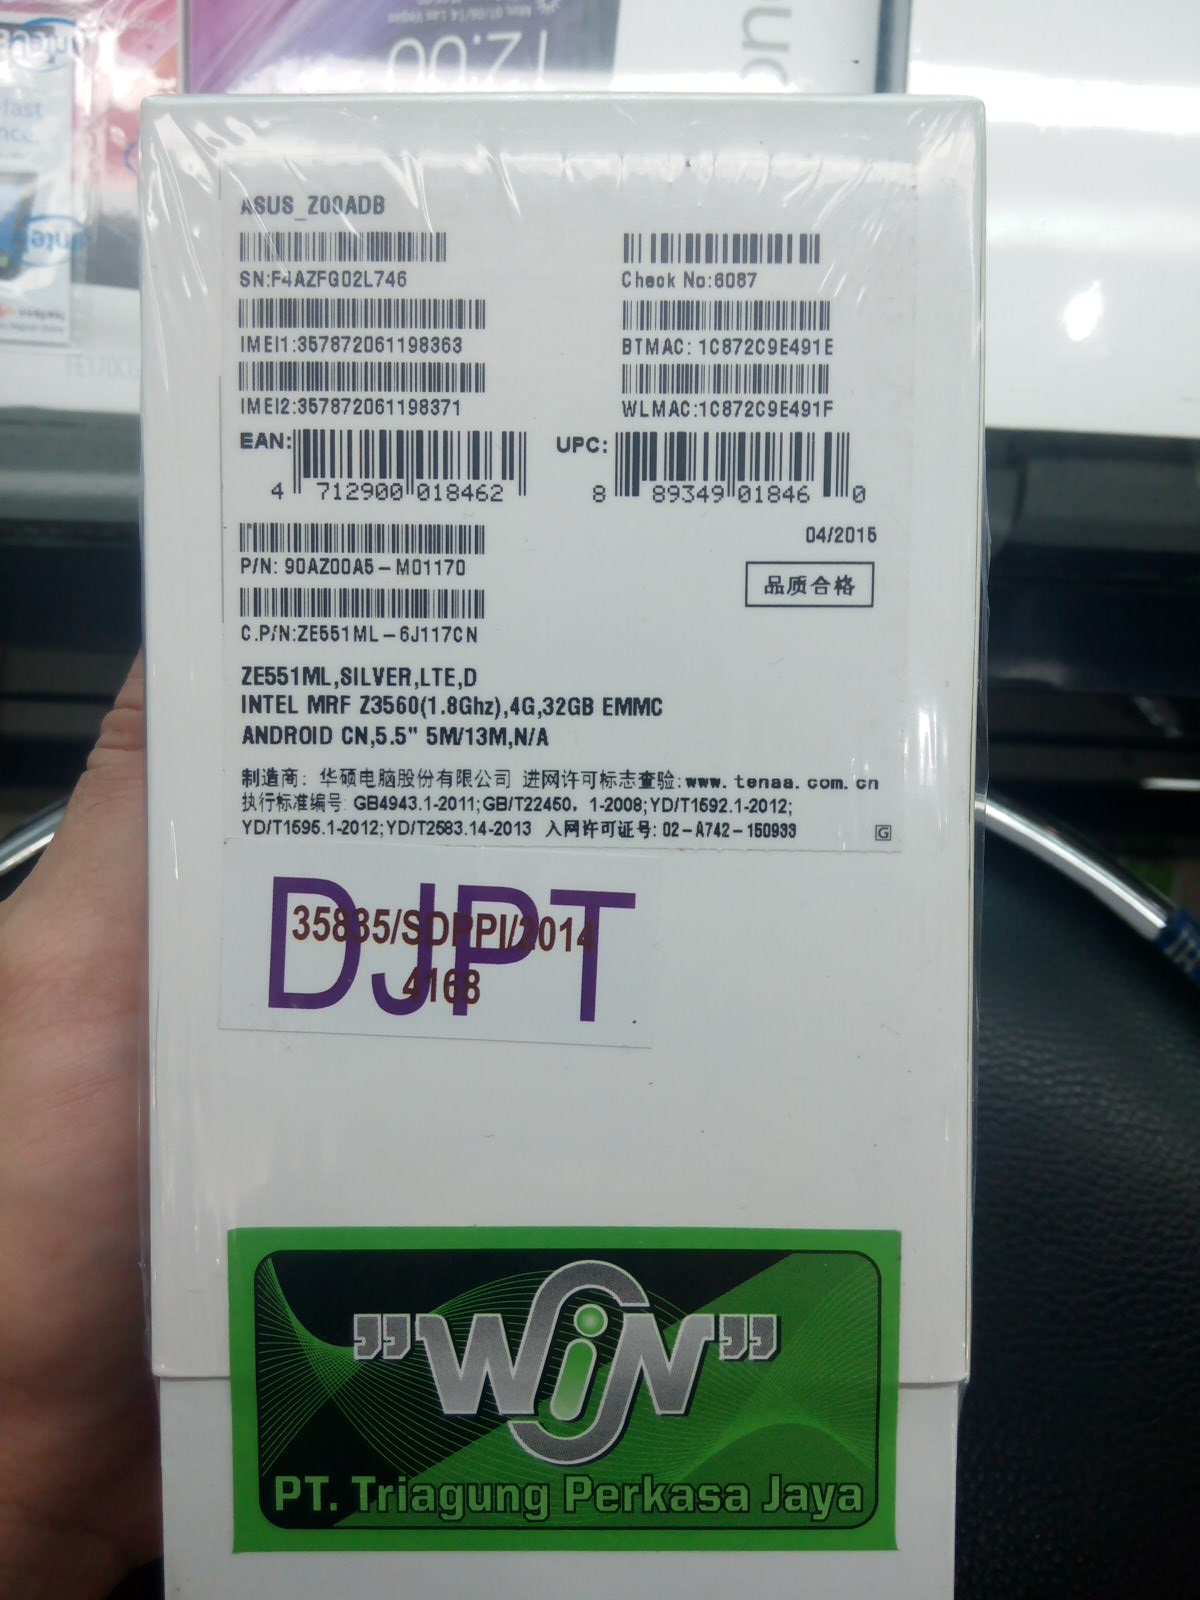 Jual ASUS ZENFONE 2 Z3560 ZE551ML 55RAM 4Gb ROM 32GB